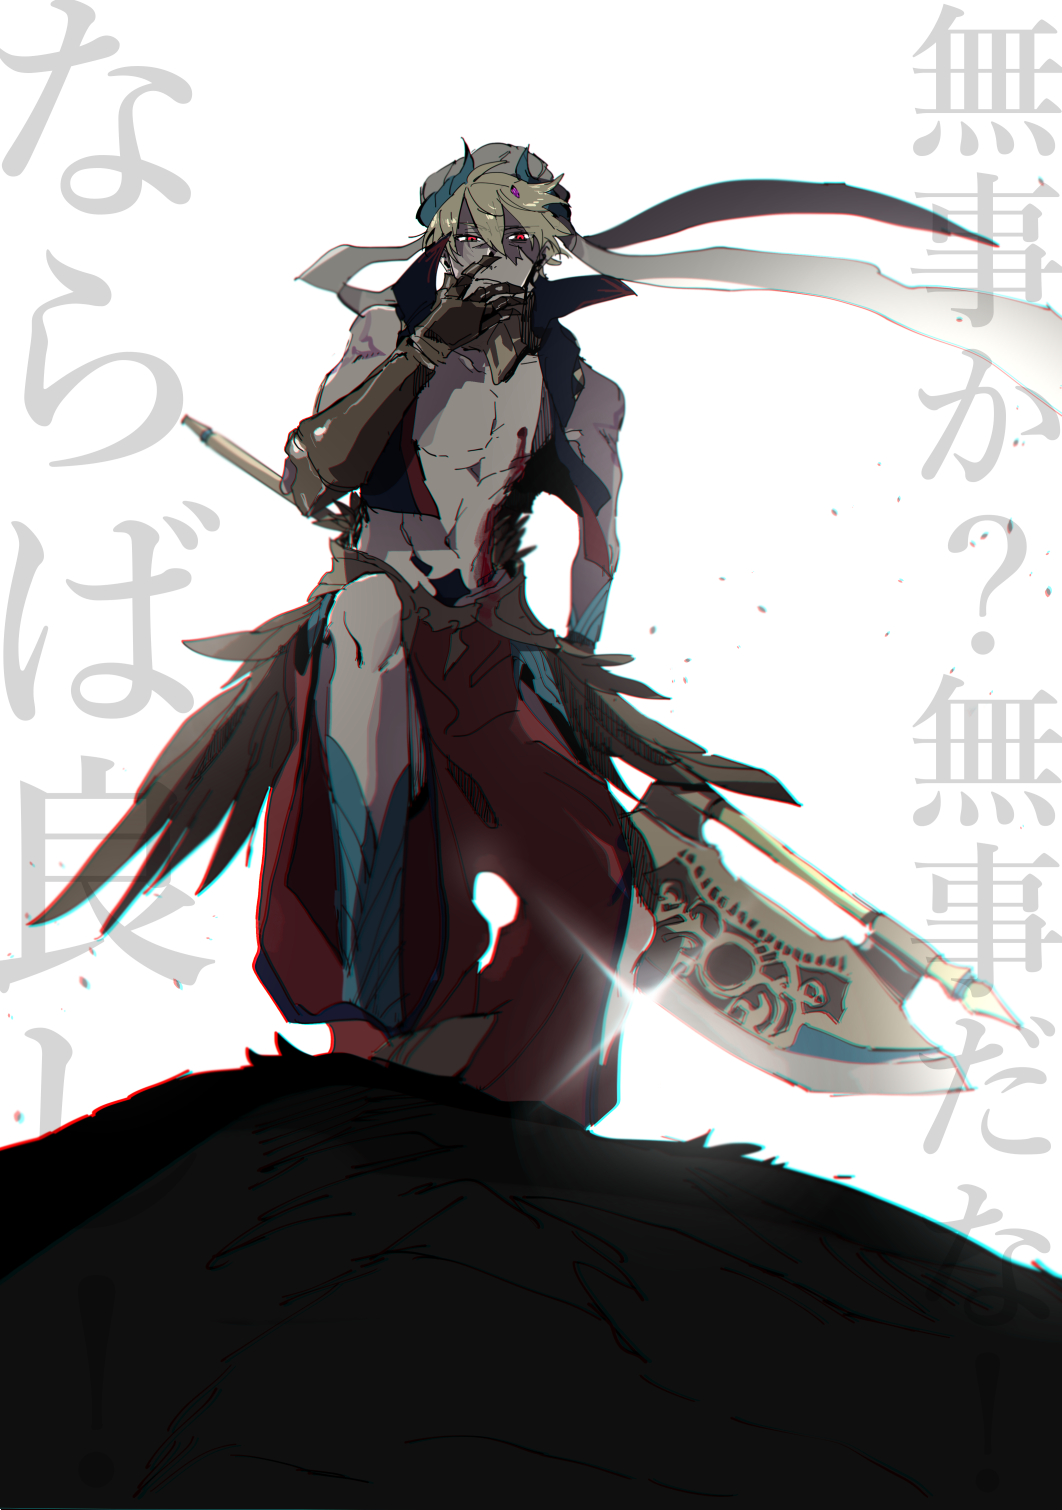 Pin oleh ♞ 初め·̩͙·˖ۗ ☄ ♞ di Fate Series Animasi, Anime